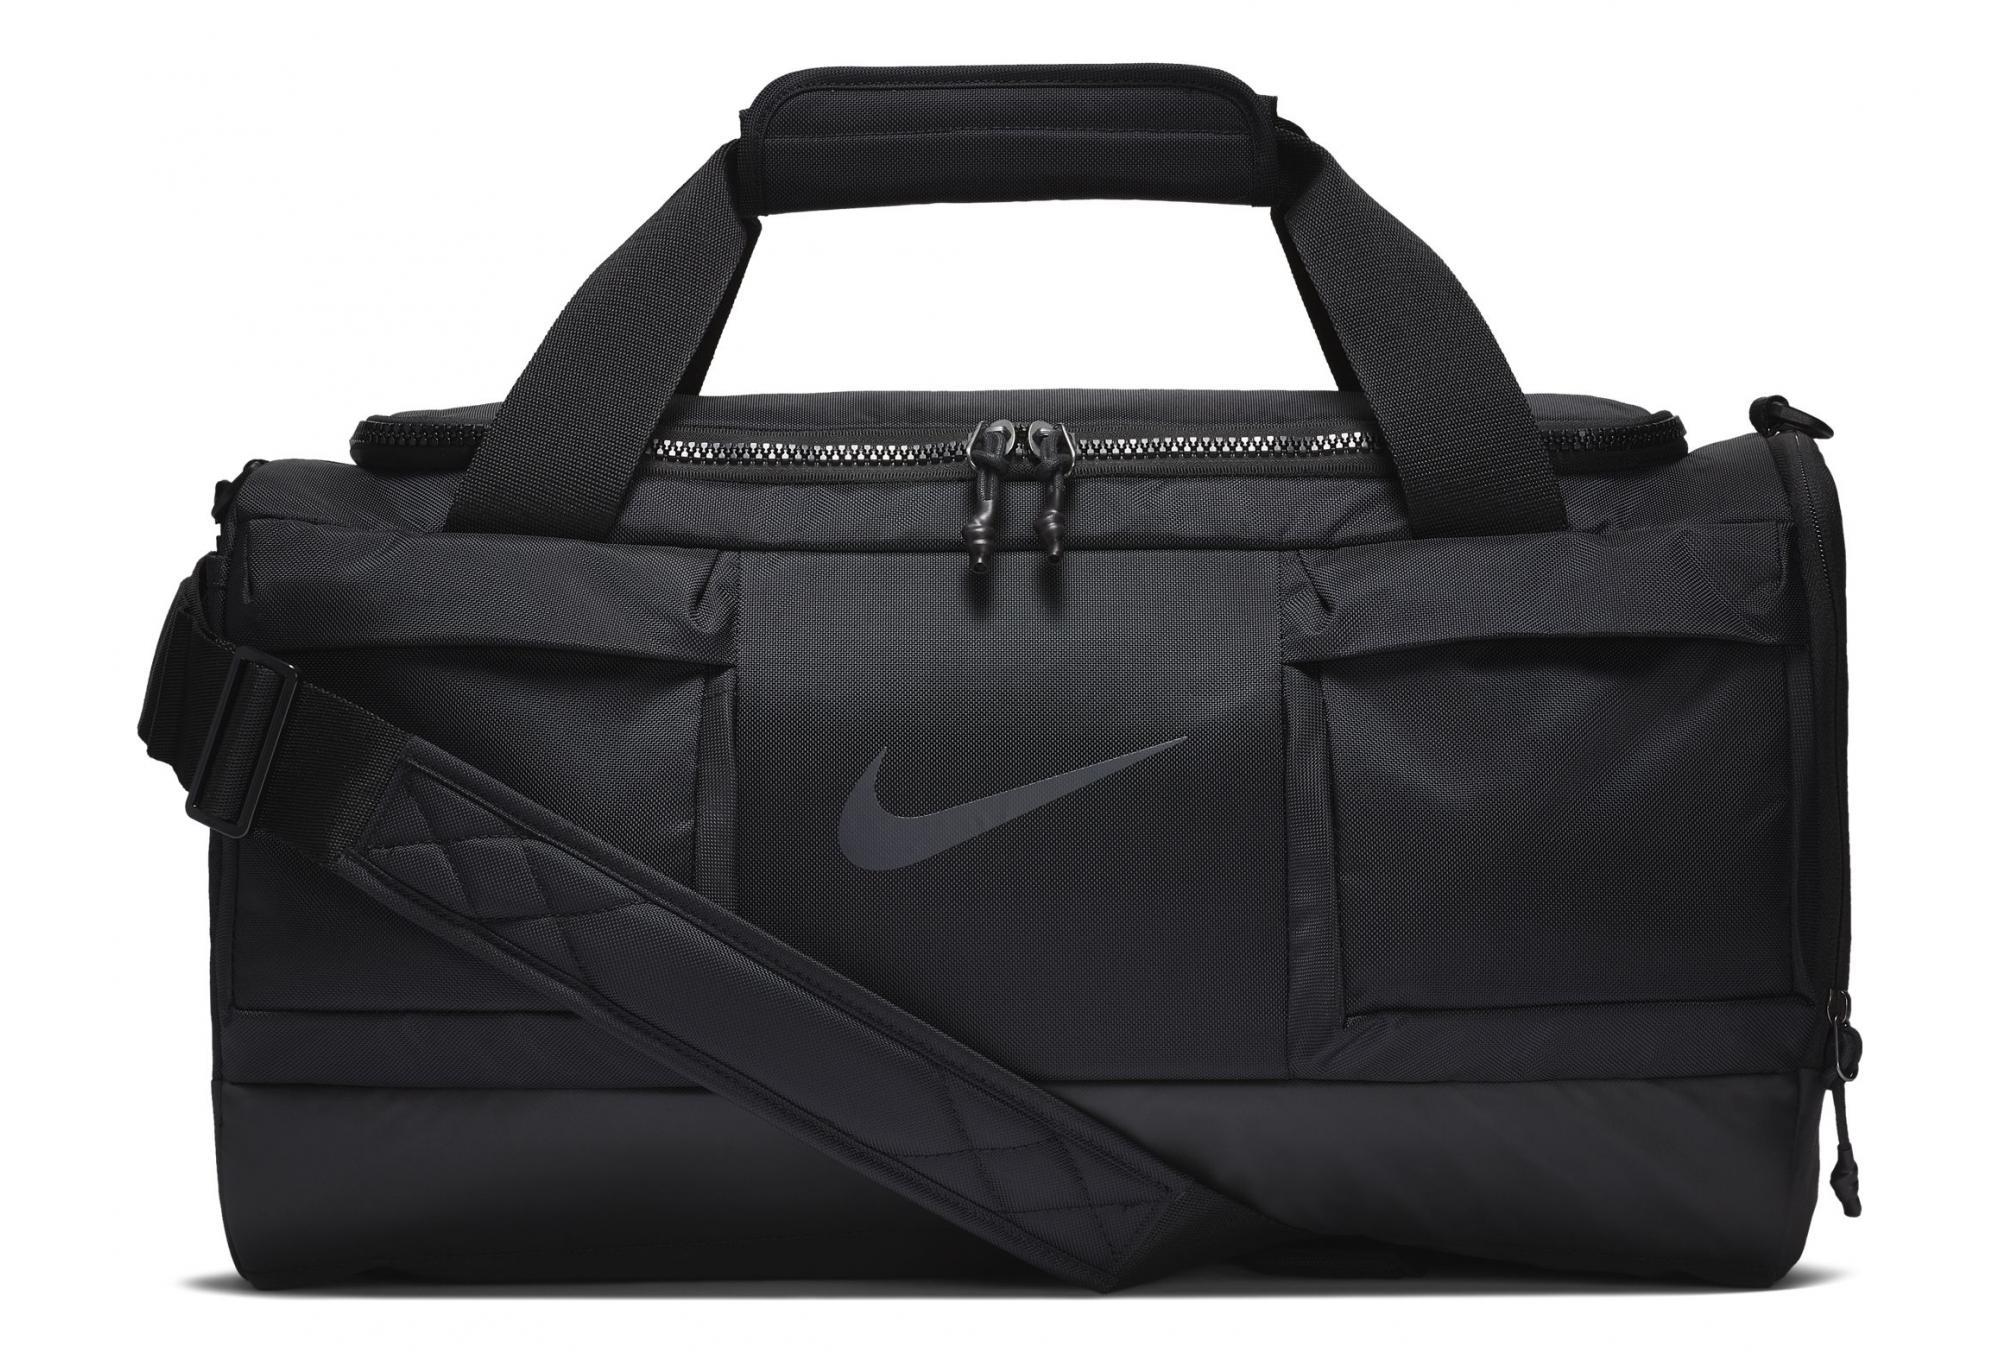 8047366bf642 NIKE Vapor Power Sport Bag Black